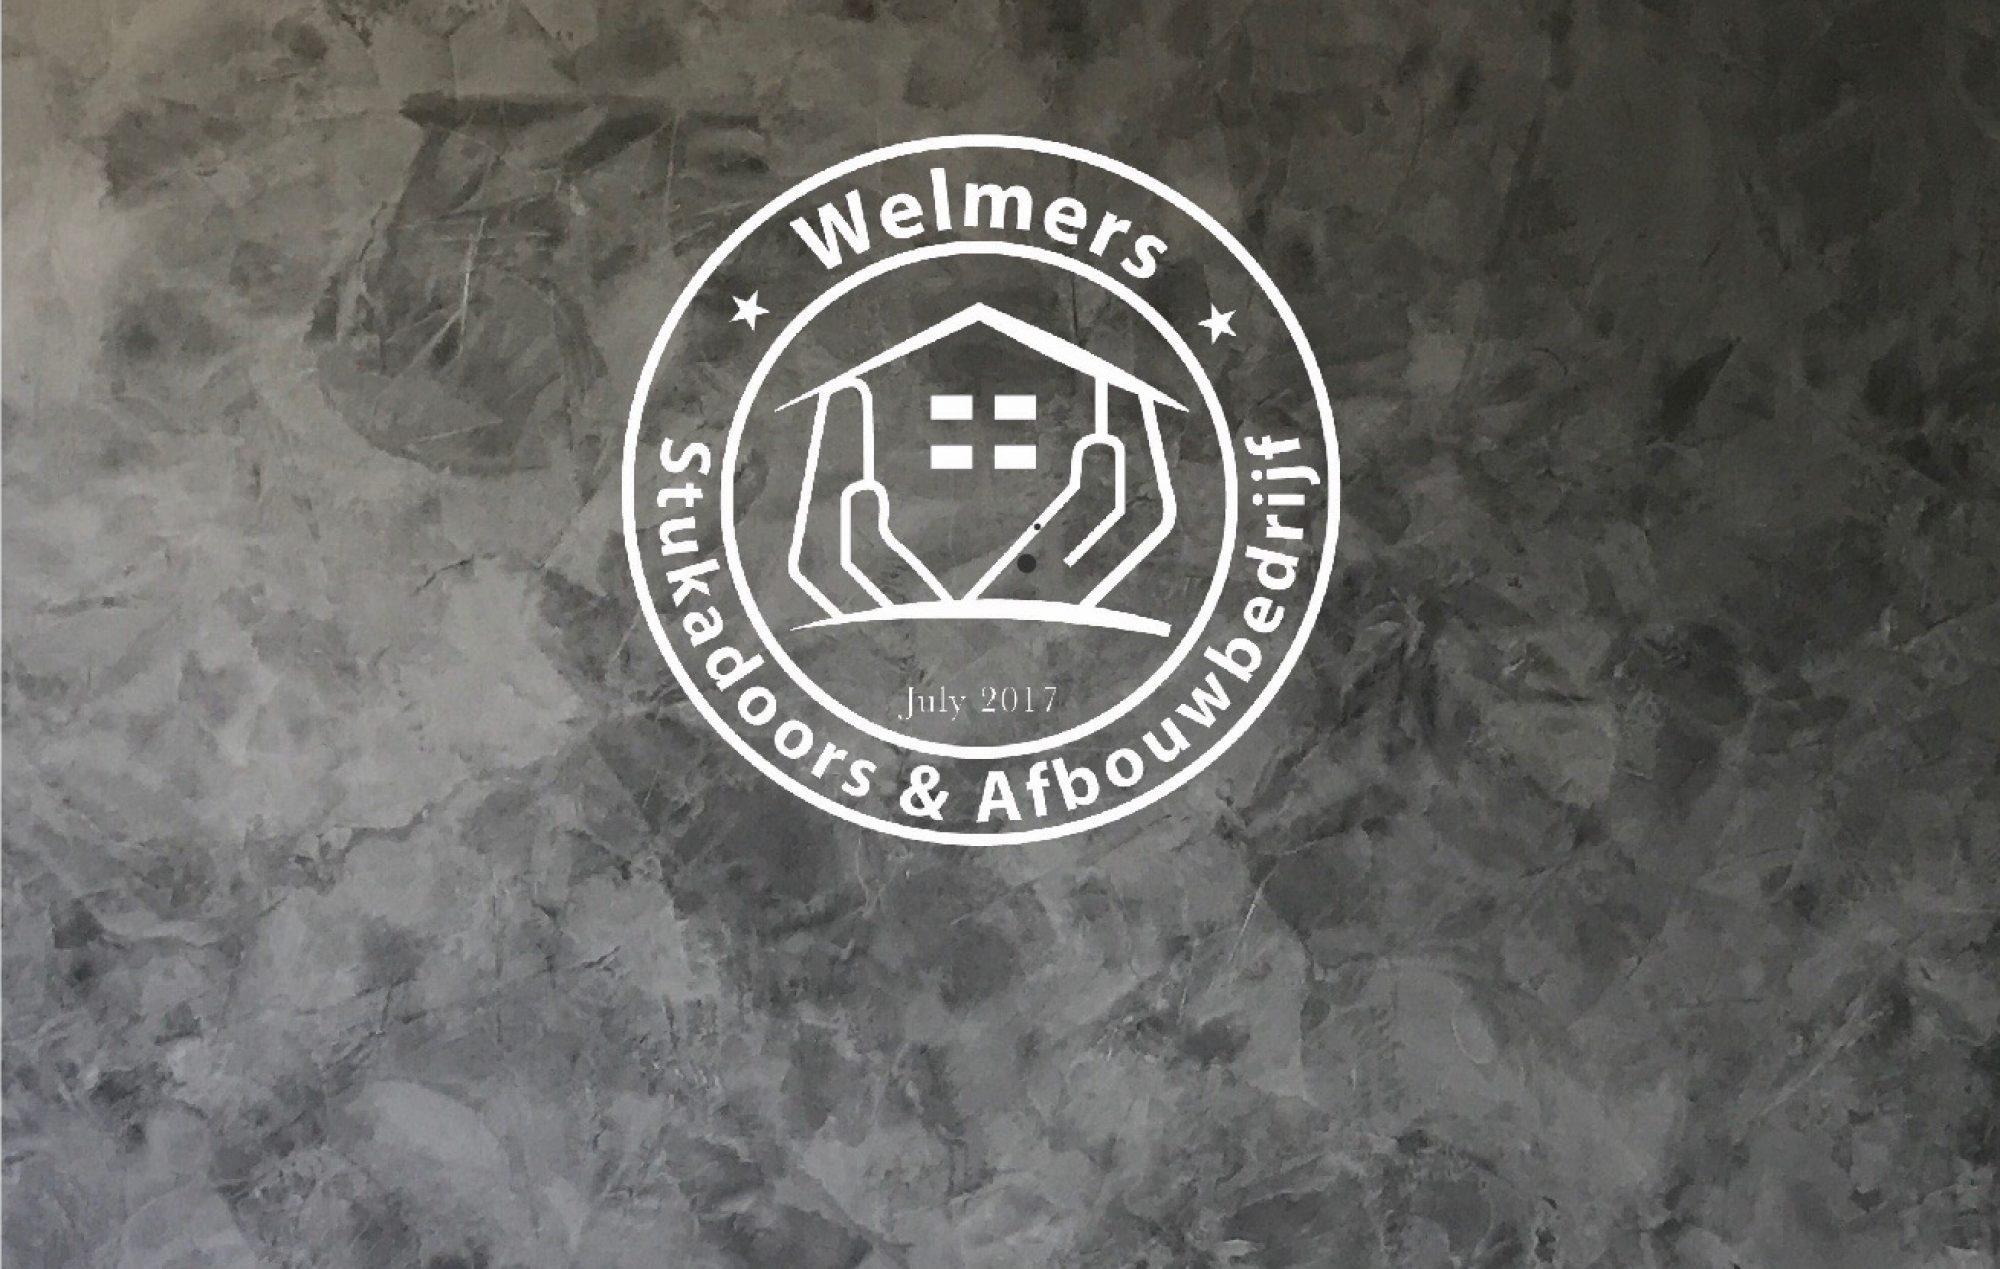 Welmers